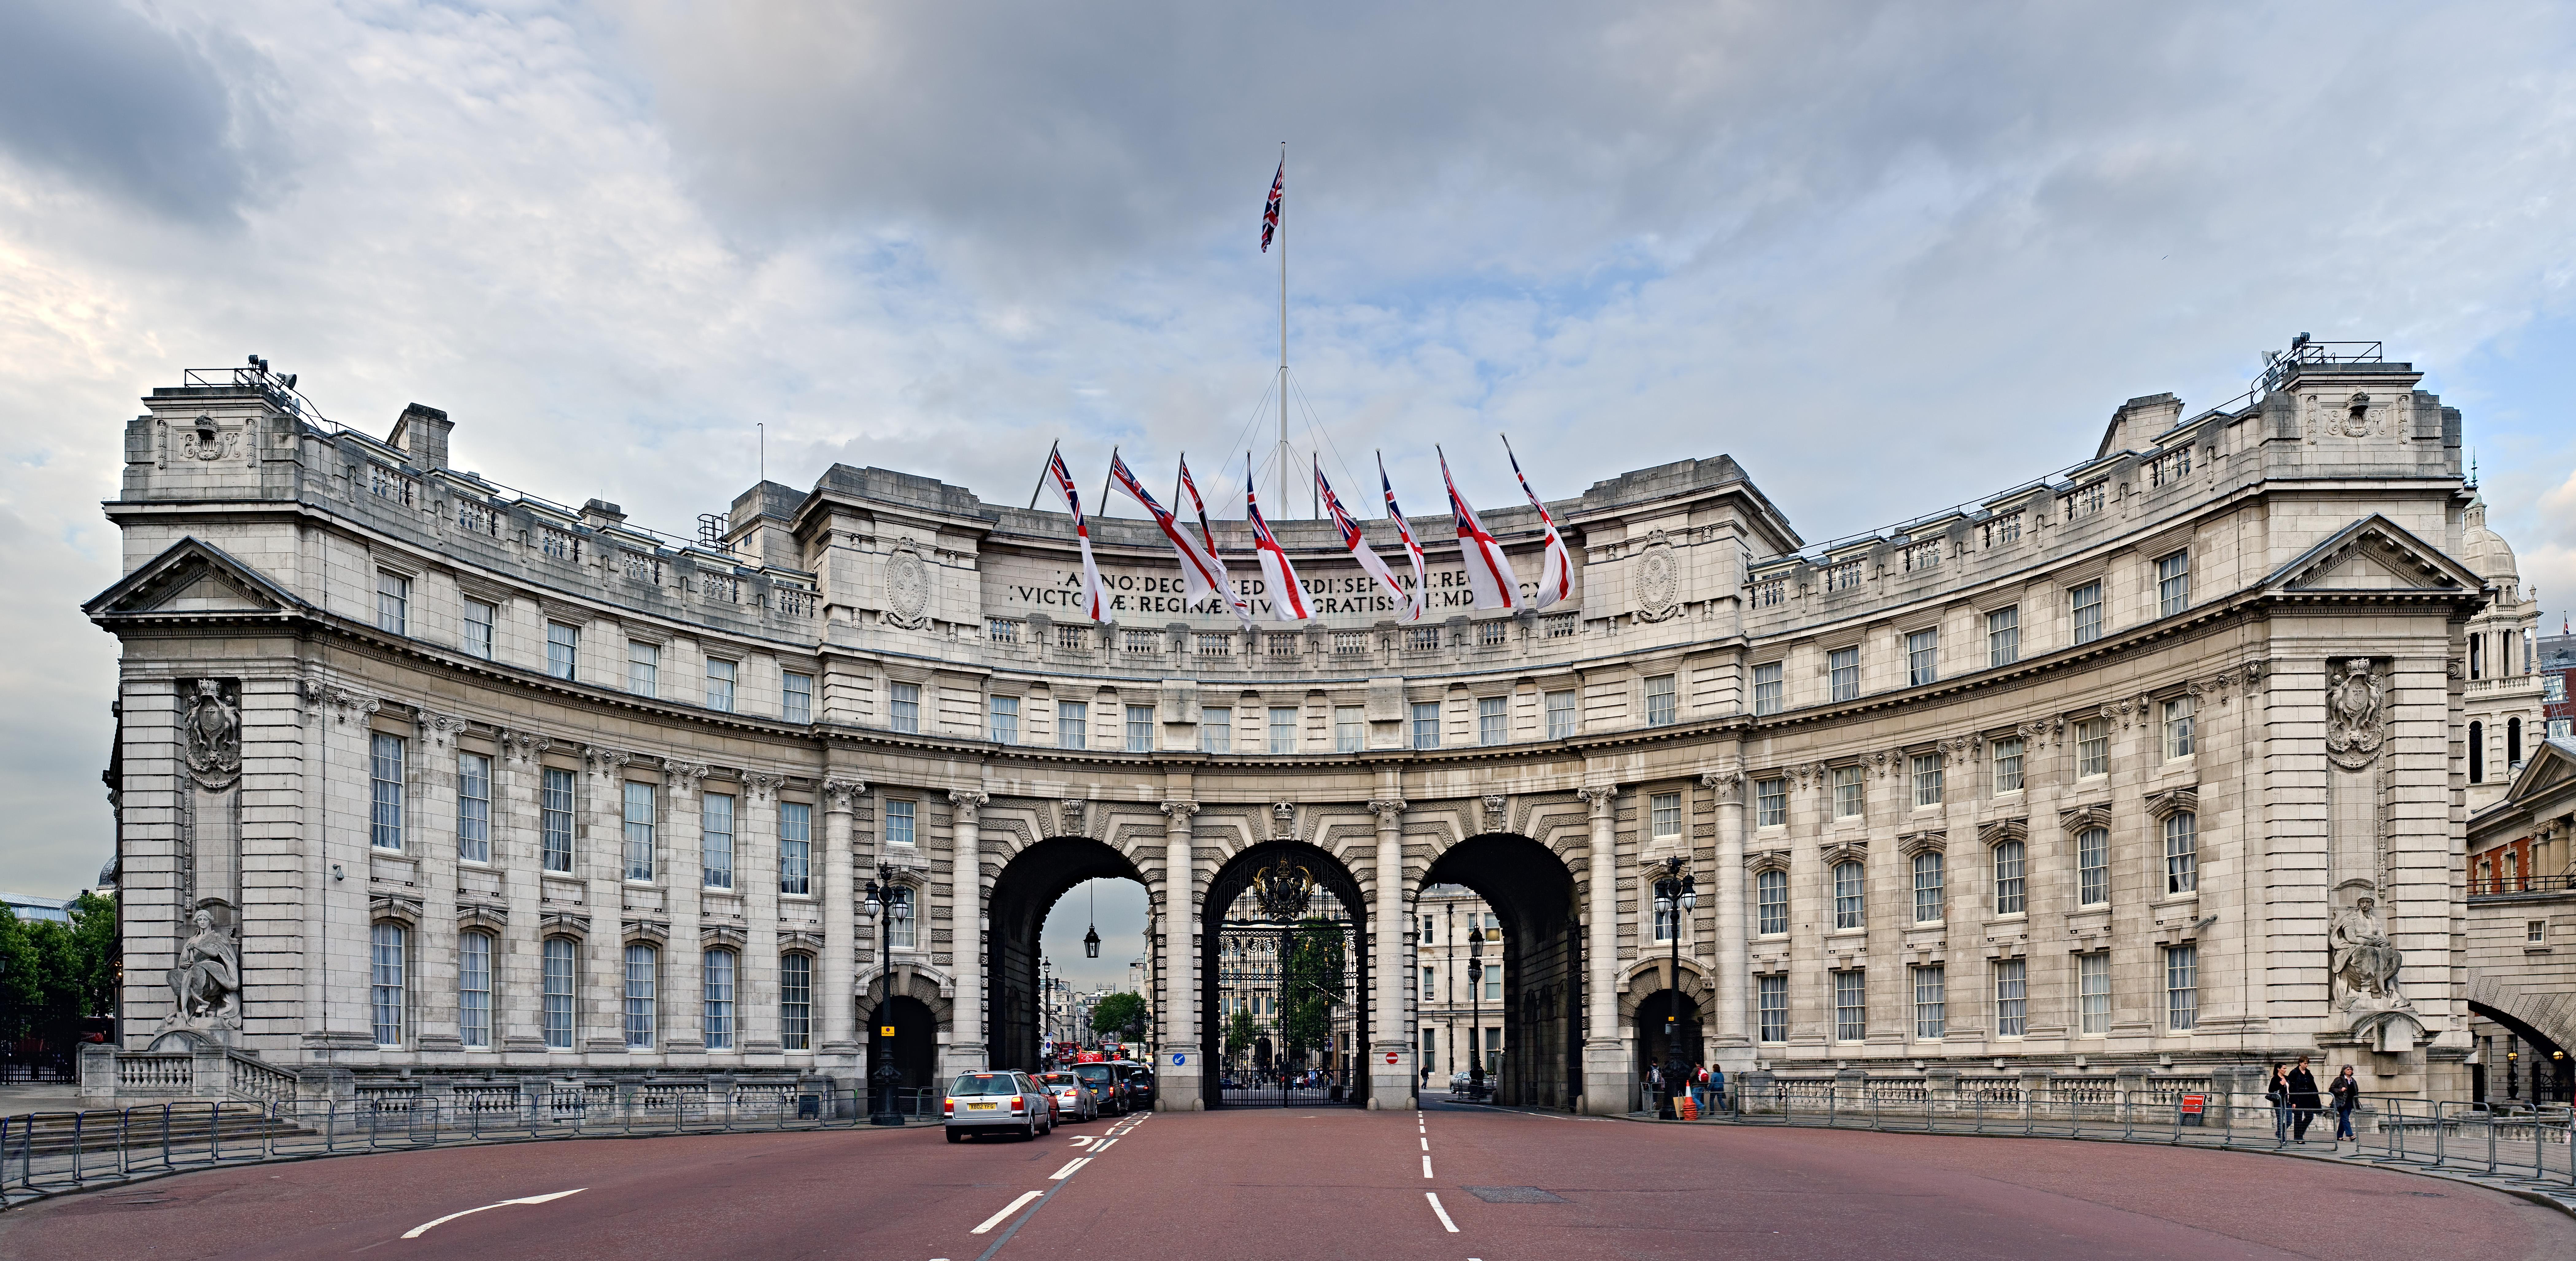 Description admiralty arch london england june 2009